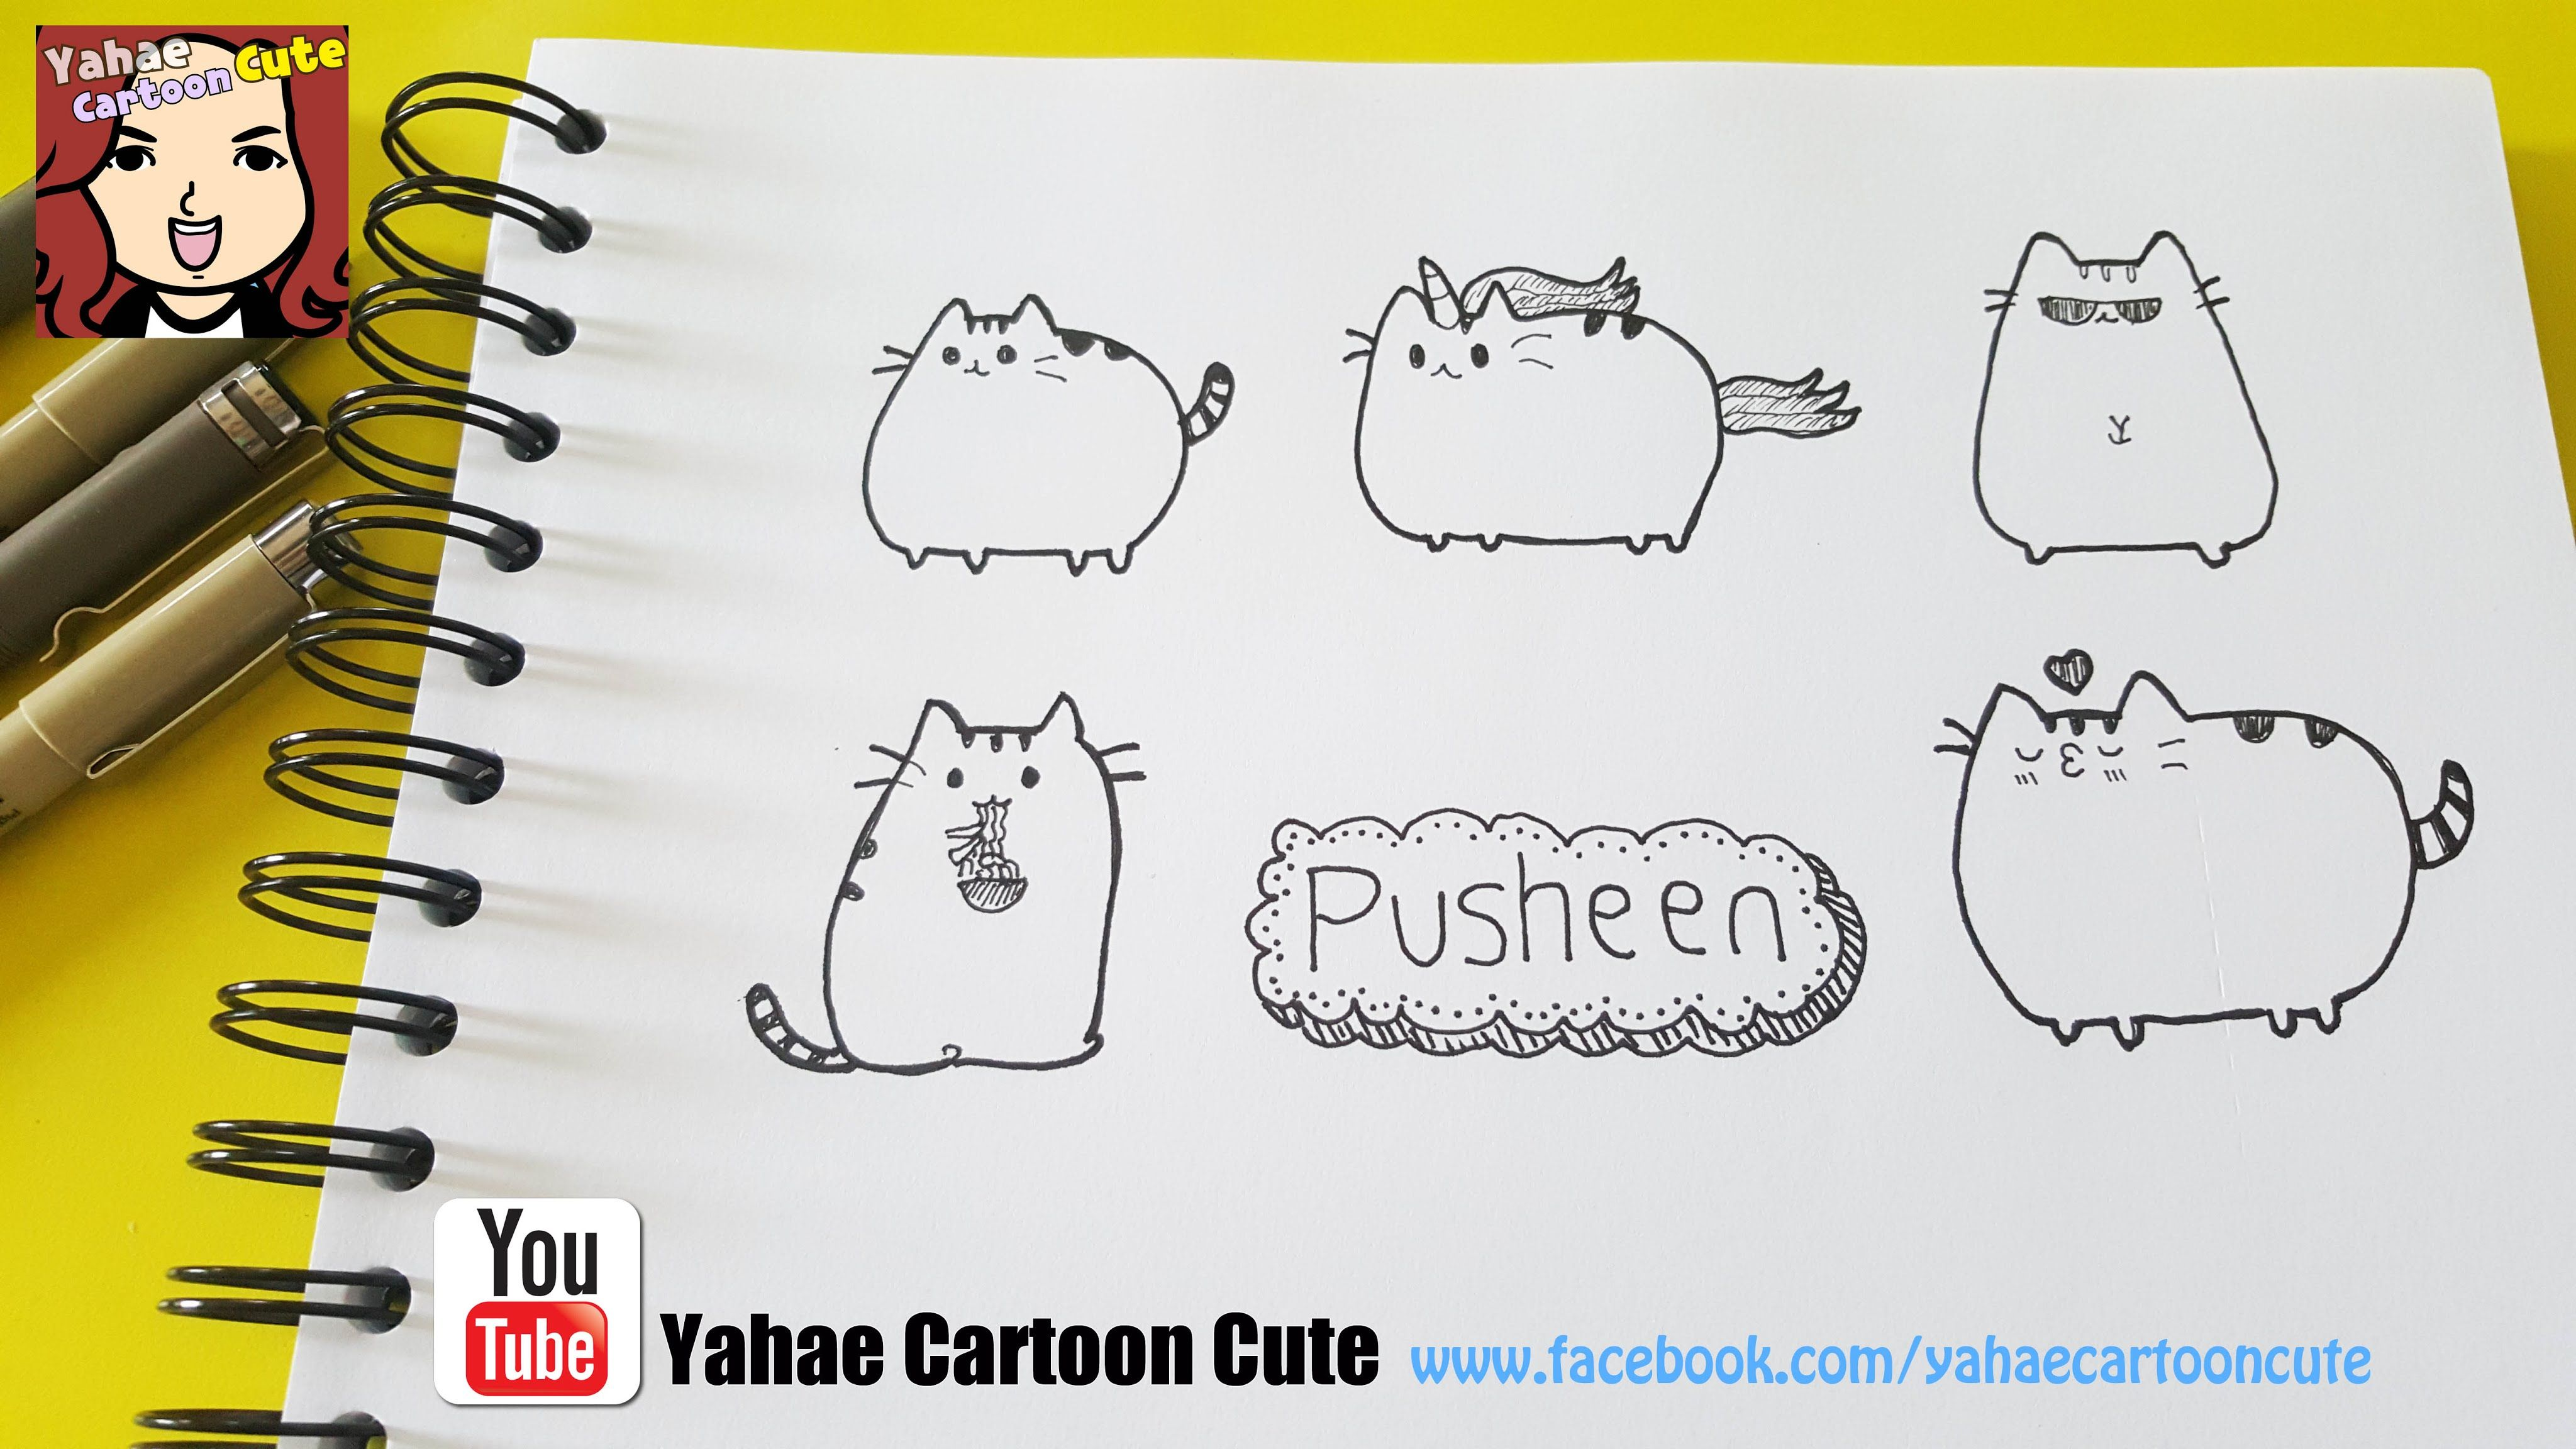 Easy To Draw Cartoon Pusheen สอนวาดร ปการ ต นเจ าแมวอ วน พ ชช น ศ ลปะ